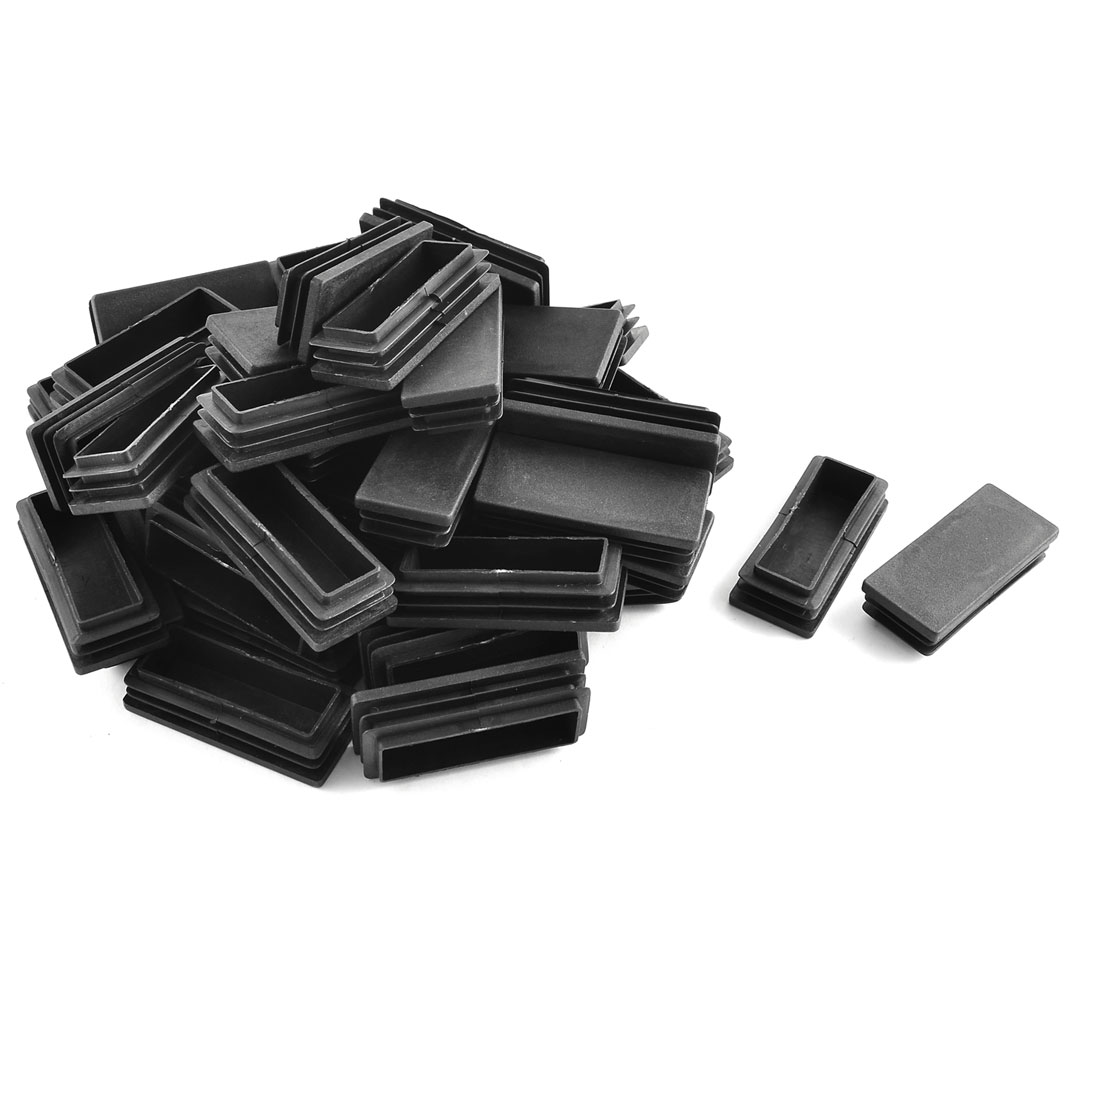 Plastic Rectangle Tube Inserts End Blanking Cap Black 30mm x 70mm 50 Pcs